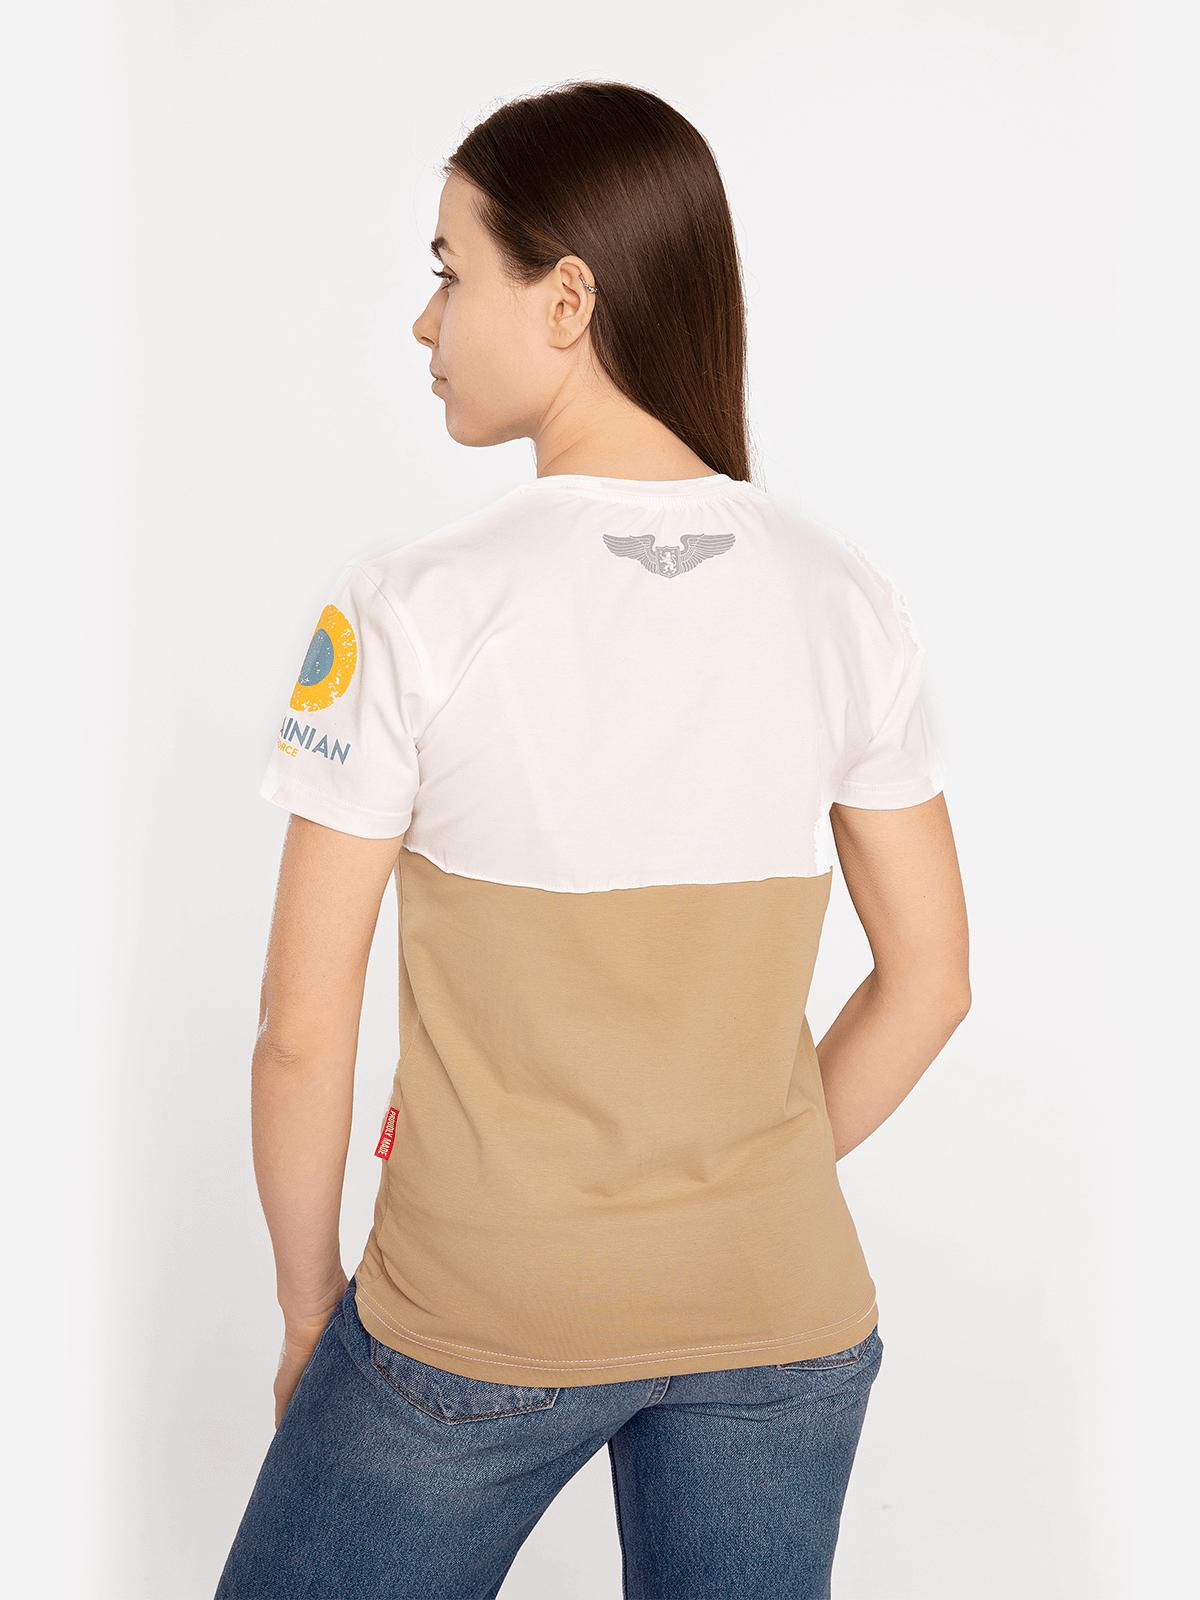 Women's T-Shirt Аn-26. Color sand.  Technique of prints applied: silkscreen printing.